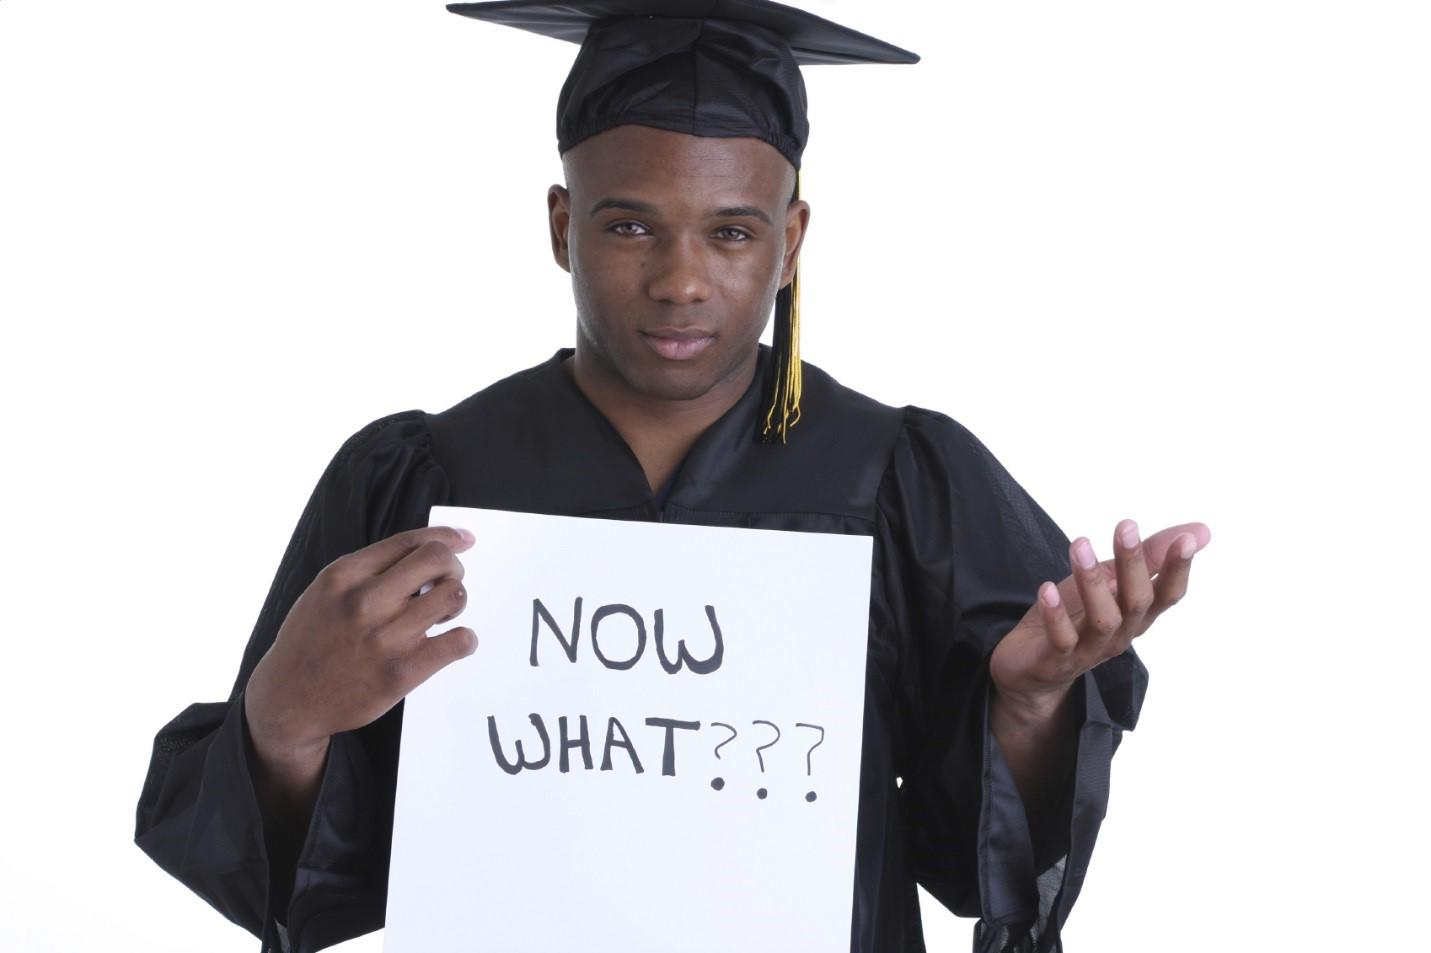 Graduate student dating freshman in college